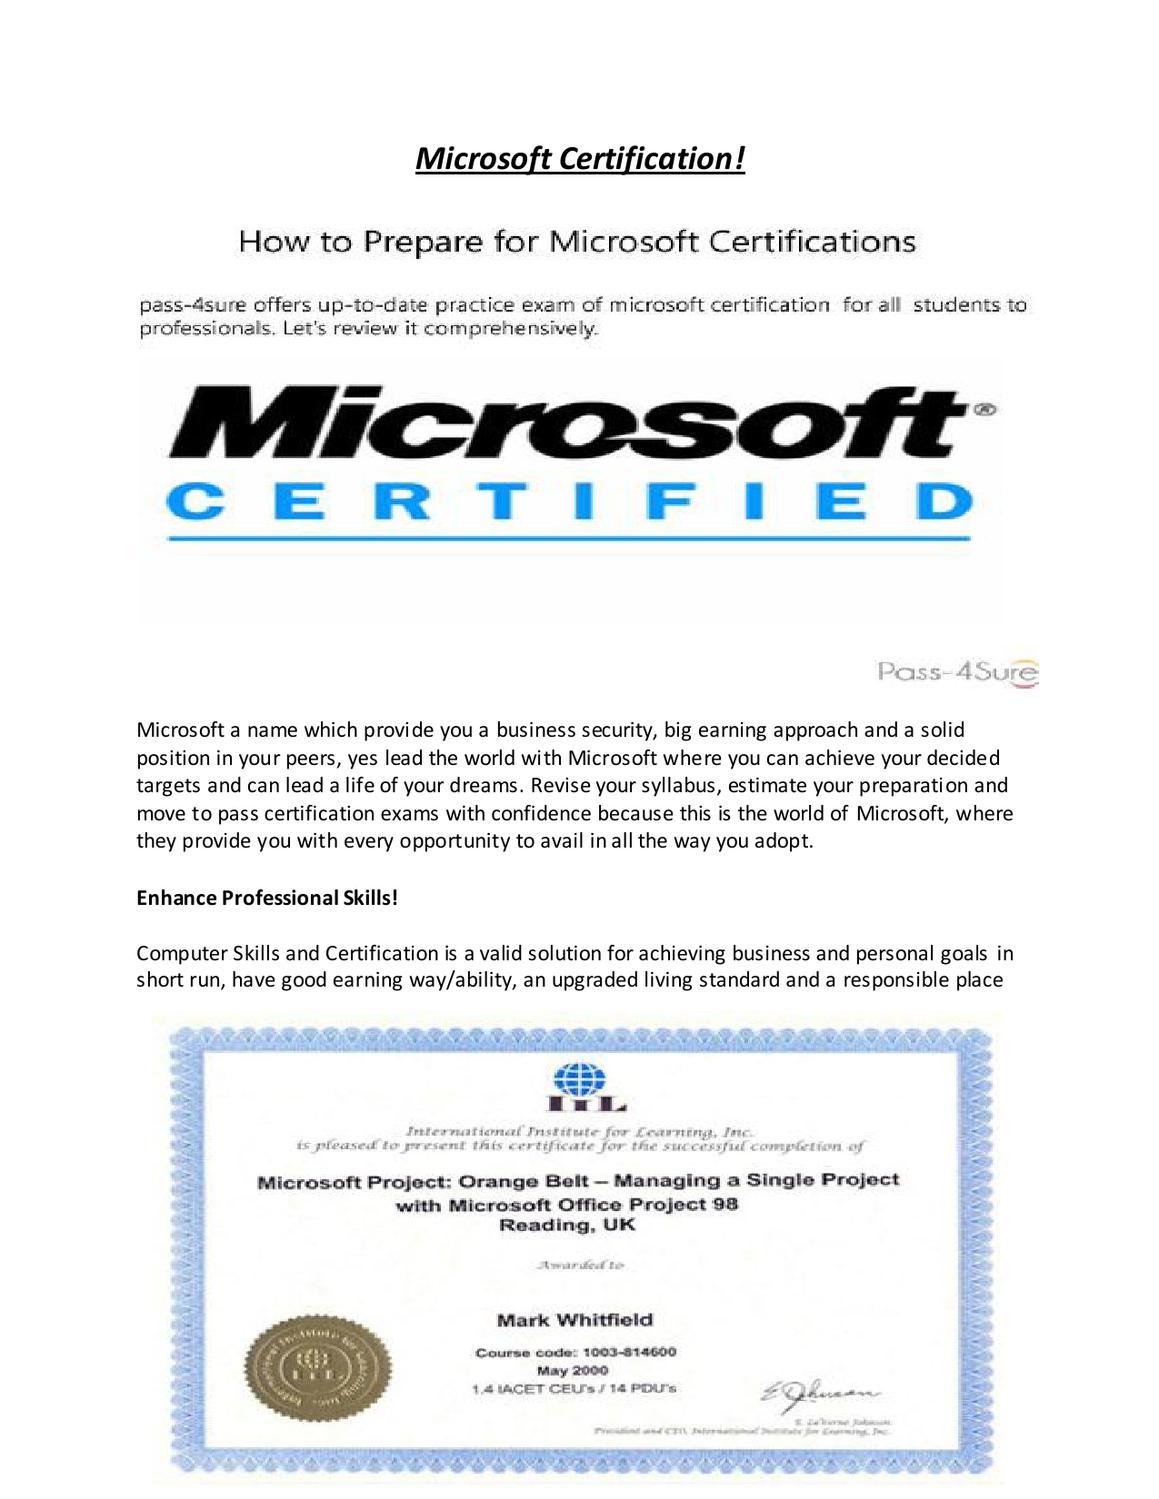 Microsoft Certification Exam By Pass 4sure By Sidra Sadaf Issuu